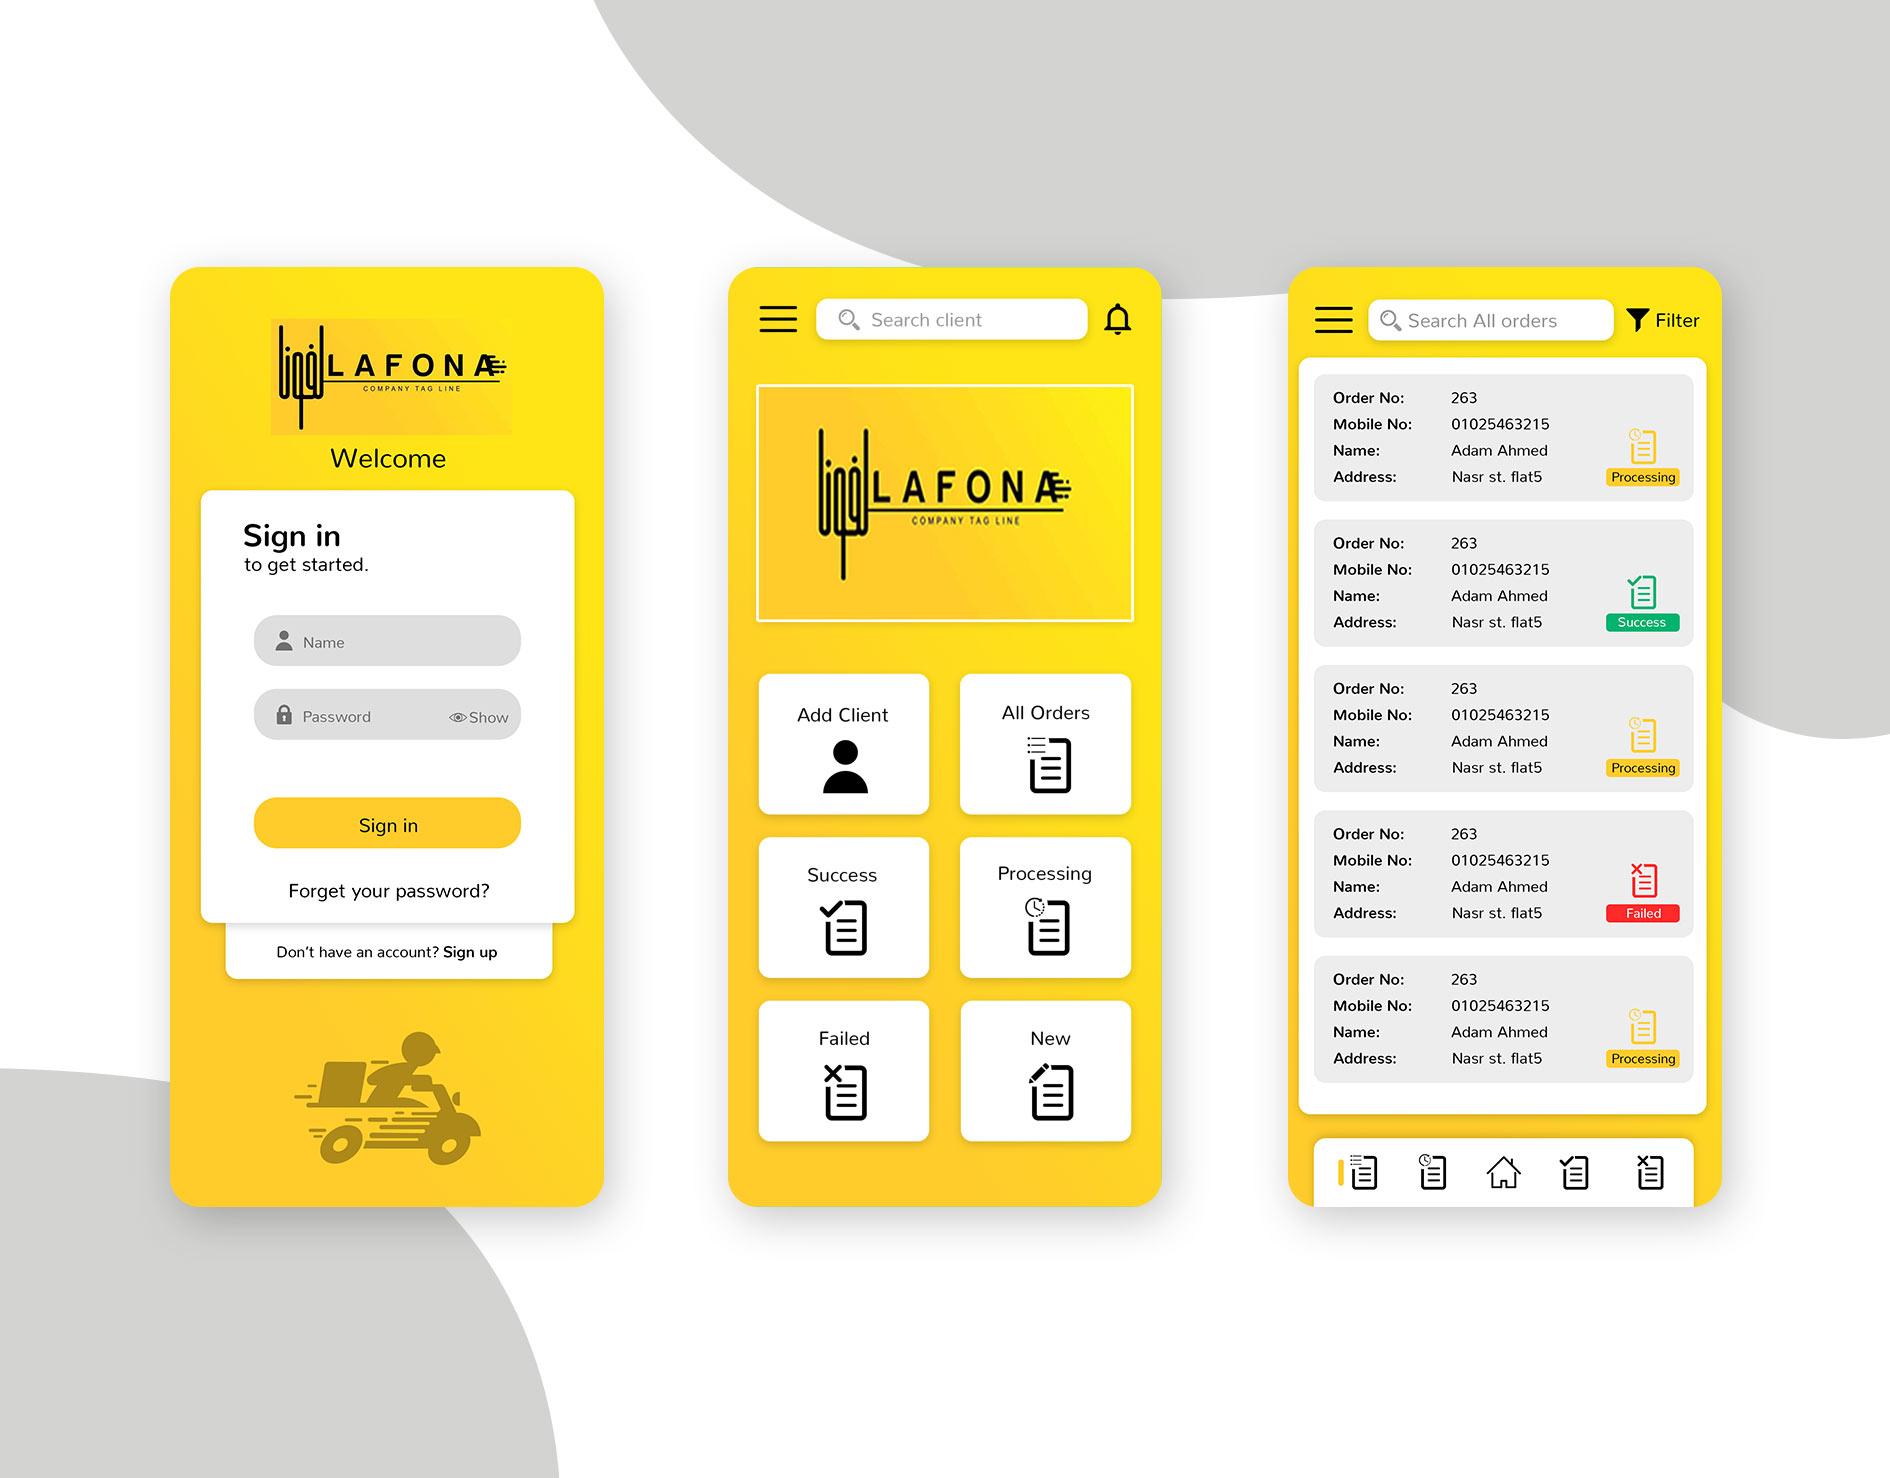 mobile-app-design-ui-ux-waleedsayed